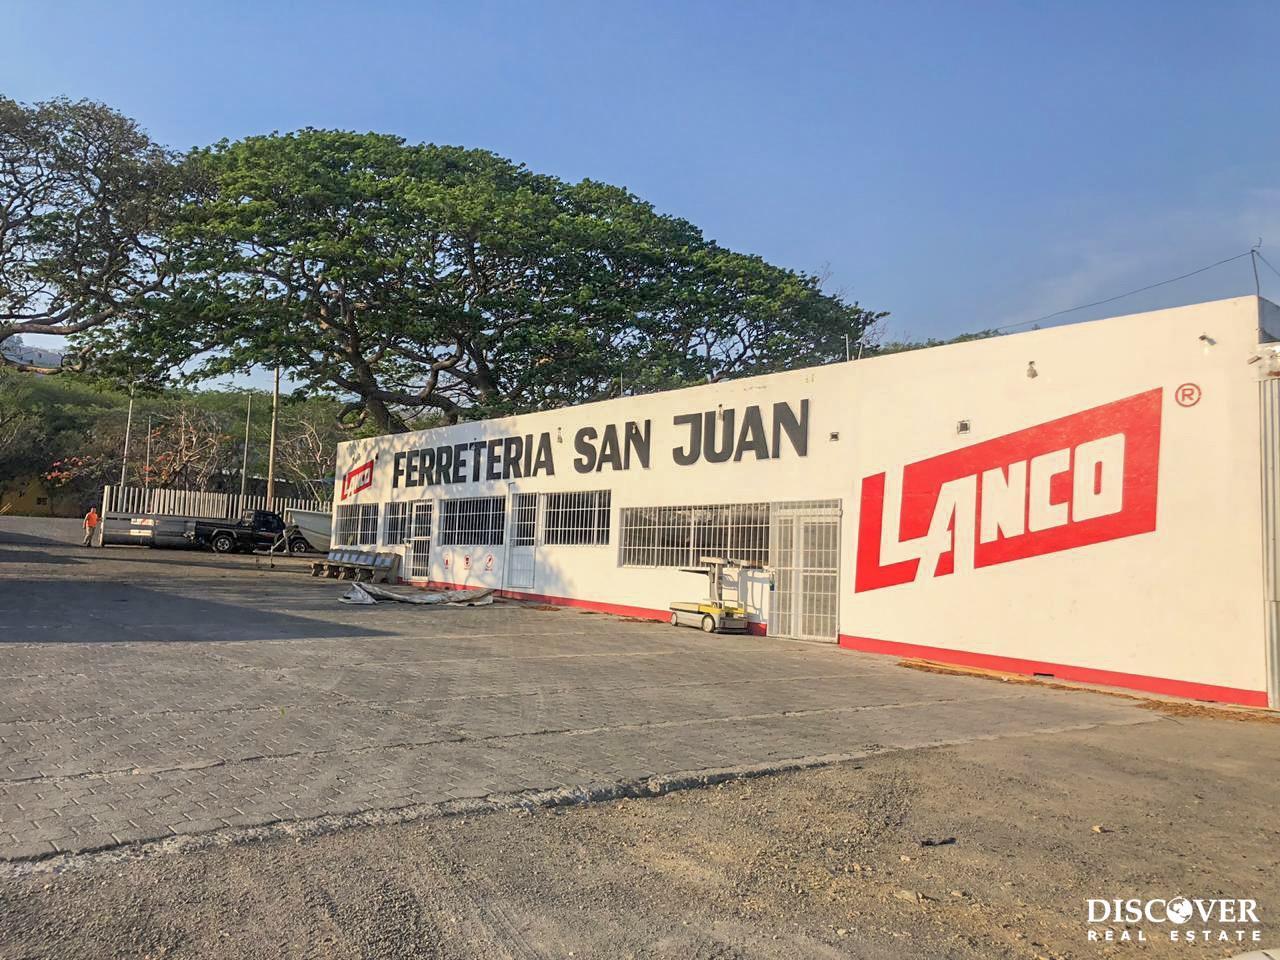 Ferretería San Juan – 2 Manzana Commercial Property for Sale